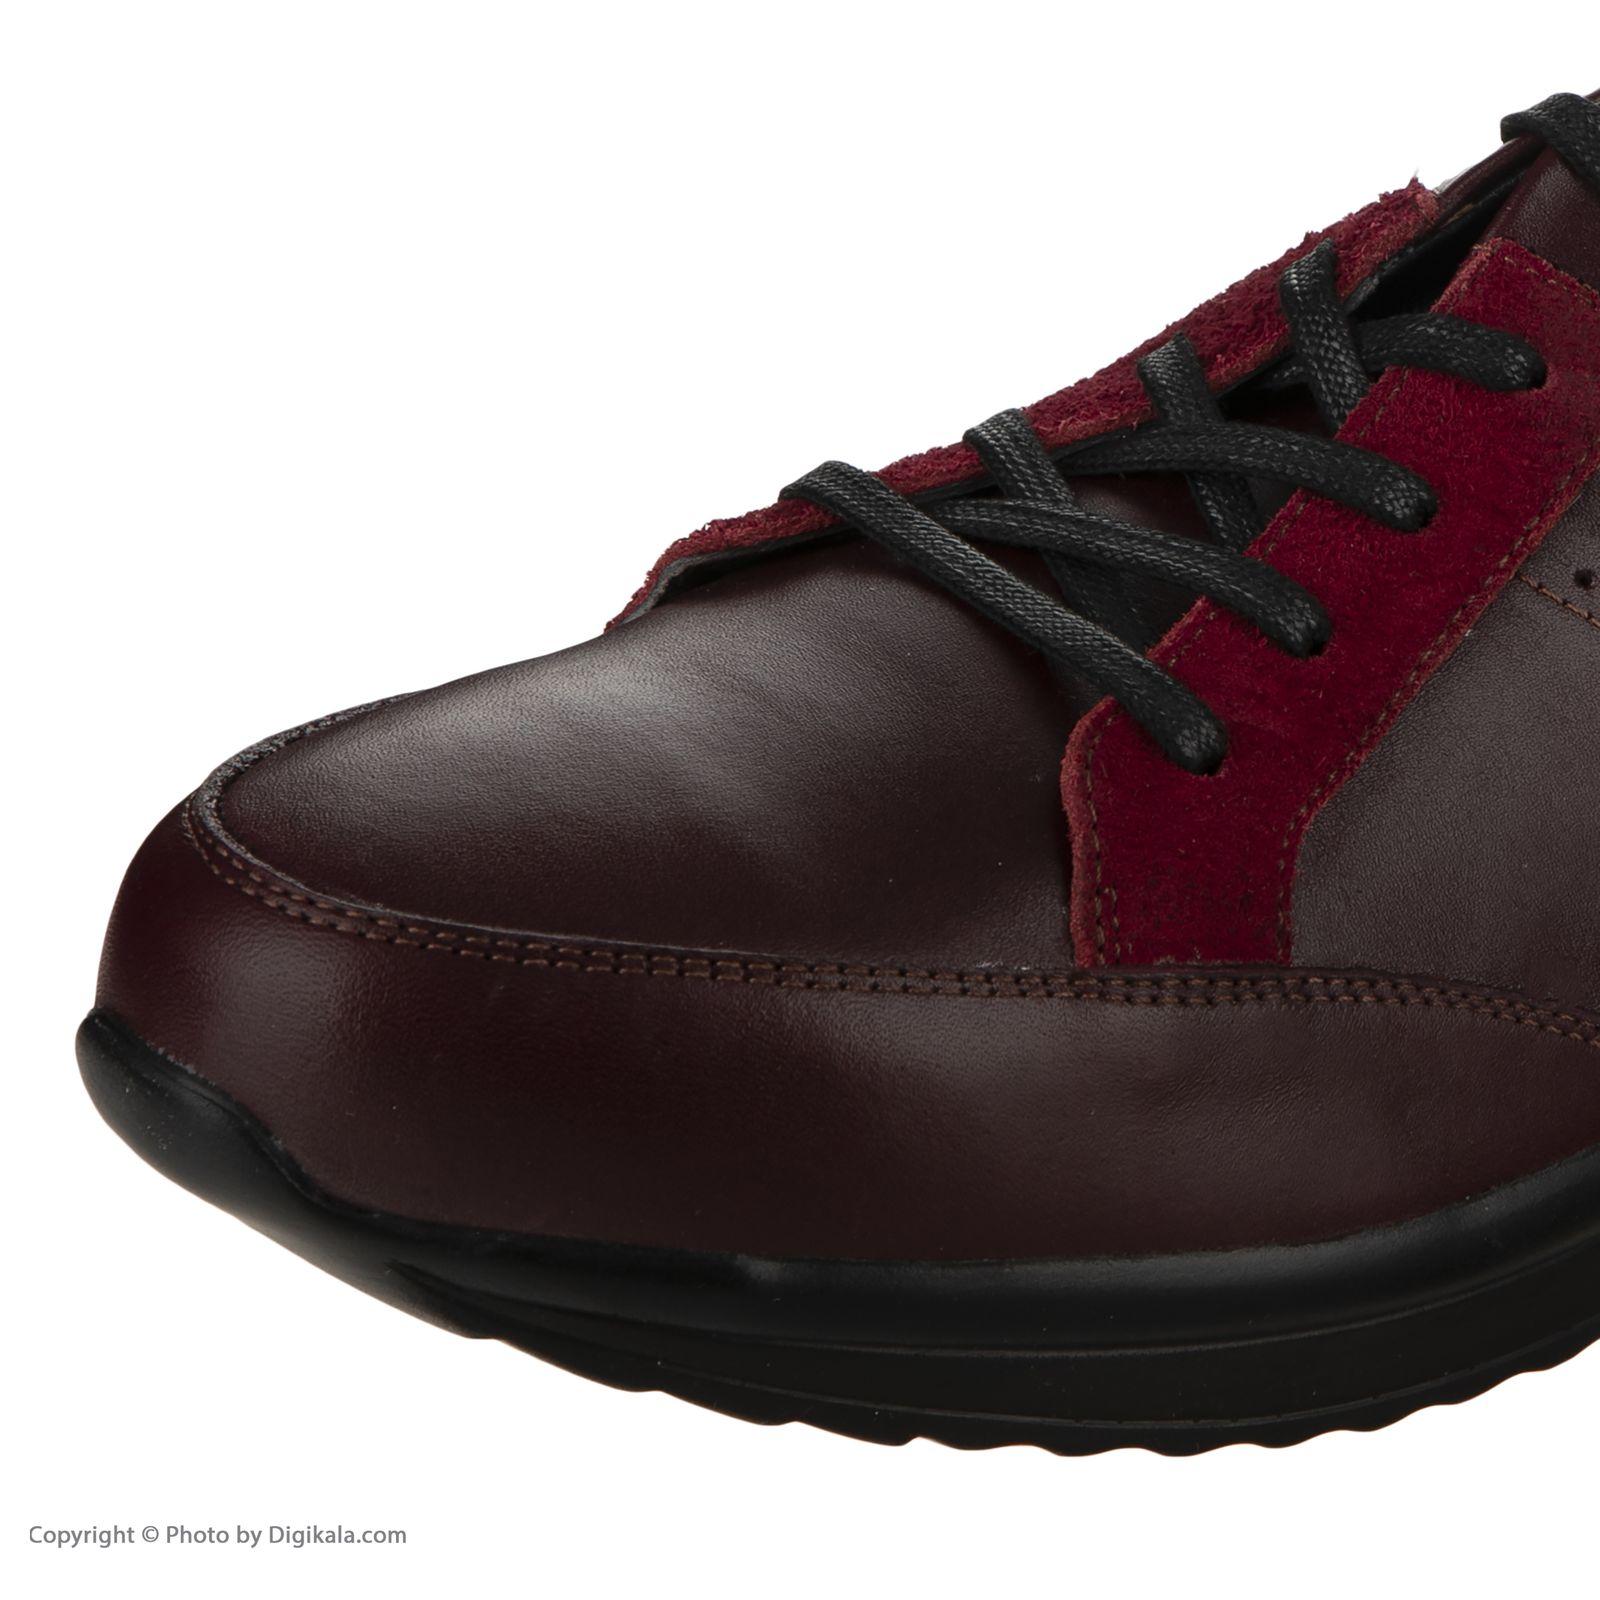 کفش روزمره مردانه چرمیران مدل 0389-Toma-005 -  - 6